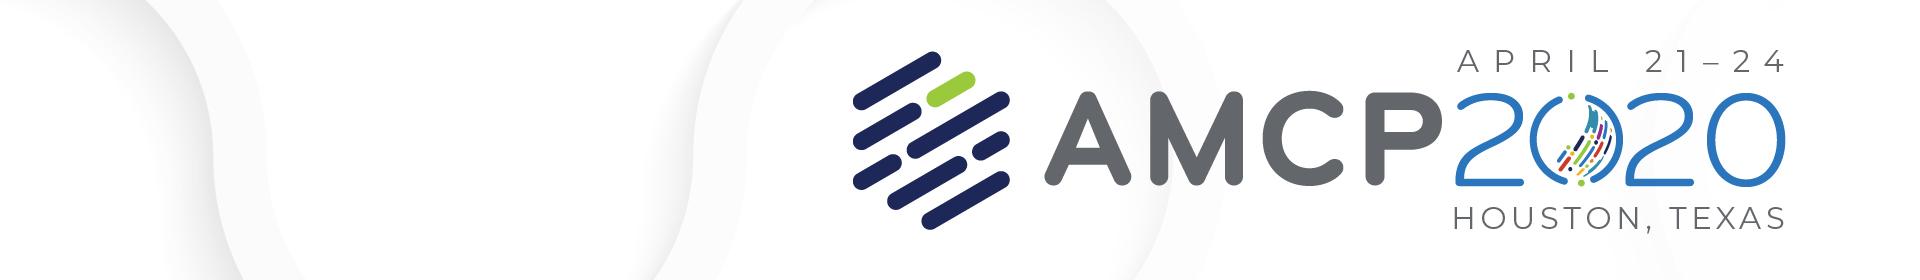 AMCP 2020 Event Banner